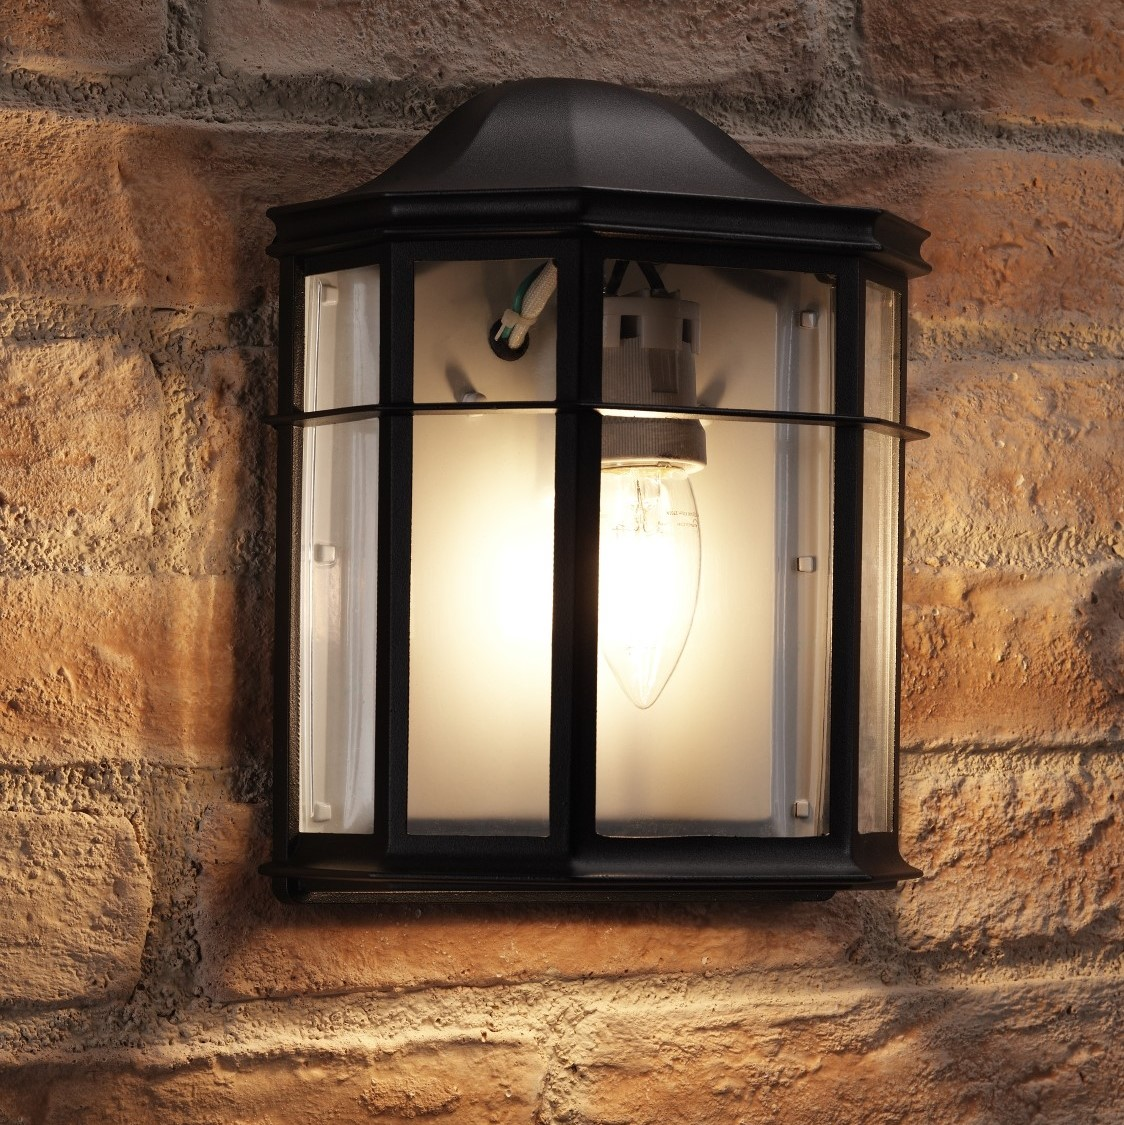 Appleton Light Vintage Industrial: Auraglow Vintage Outdoor Wall Light